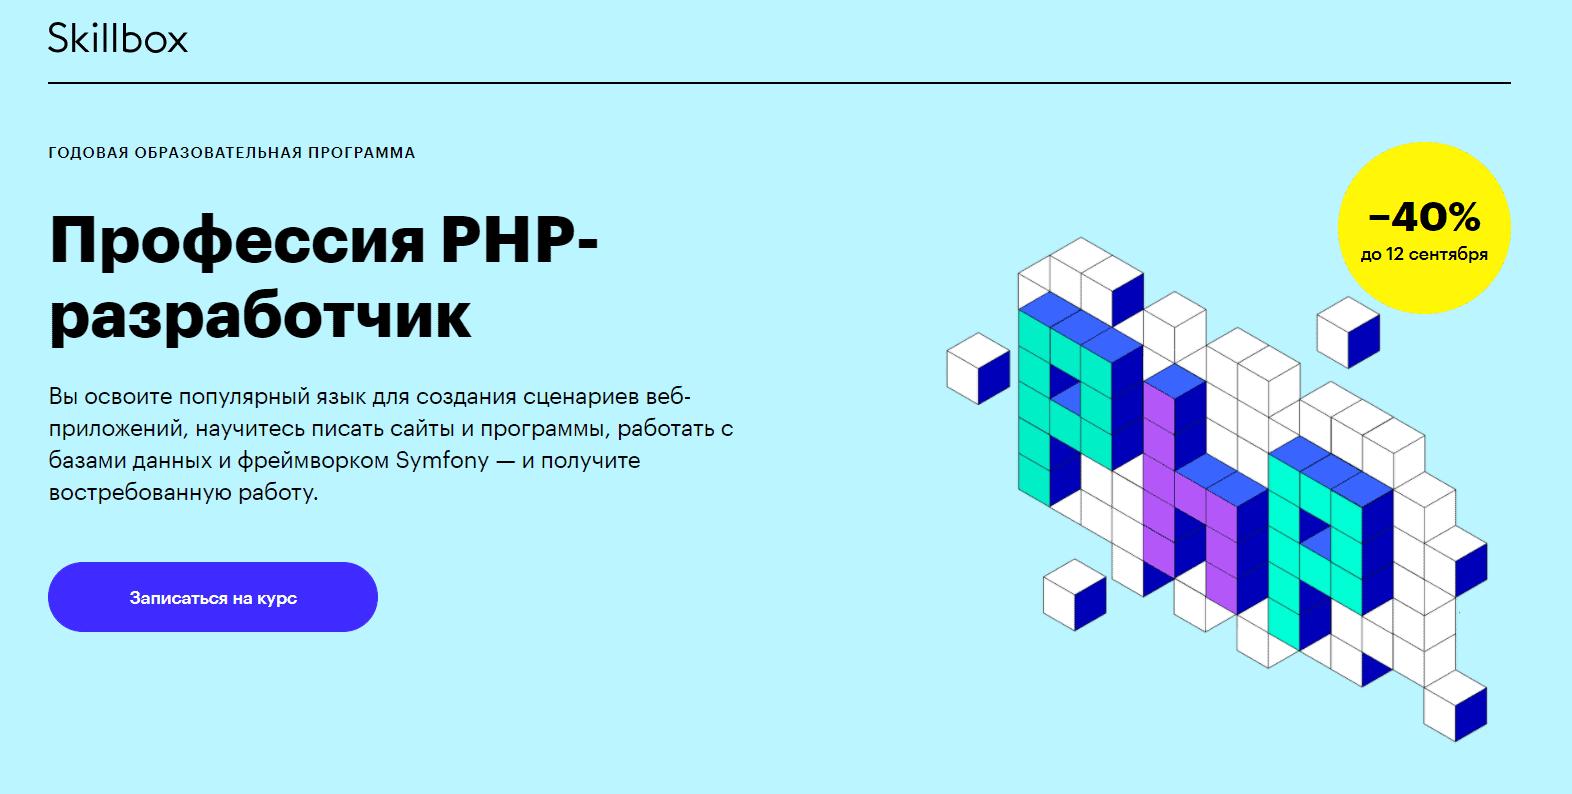 Профессия PHP-разработчик